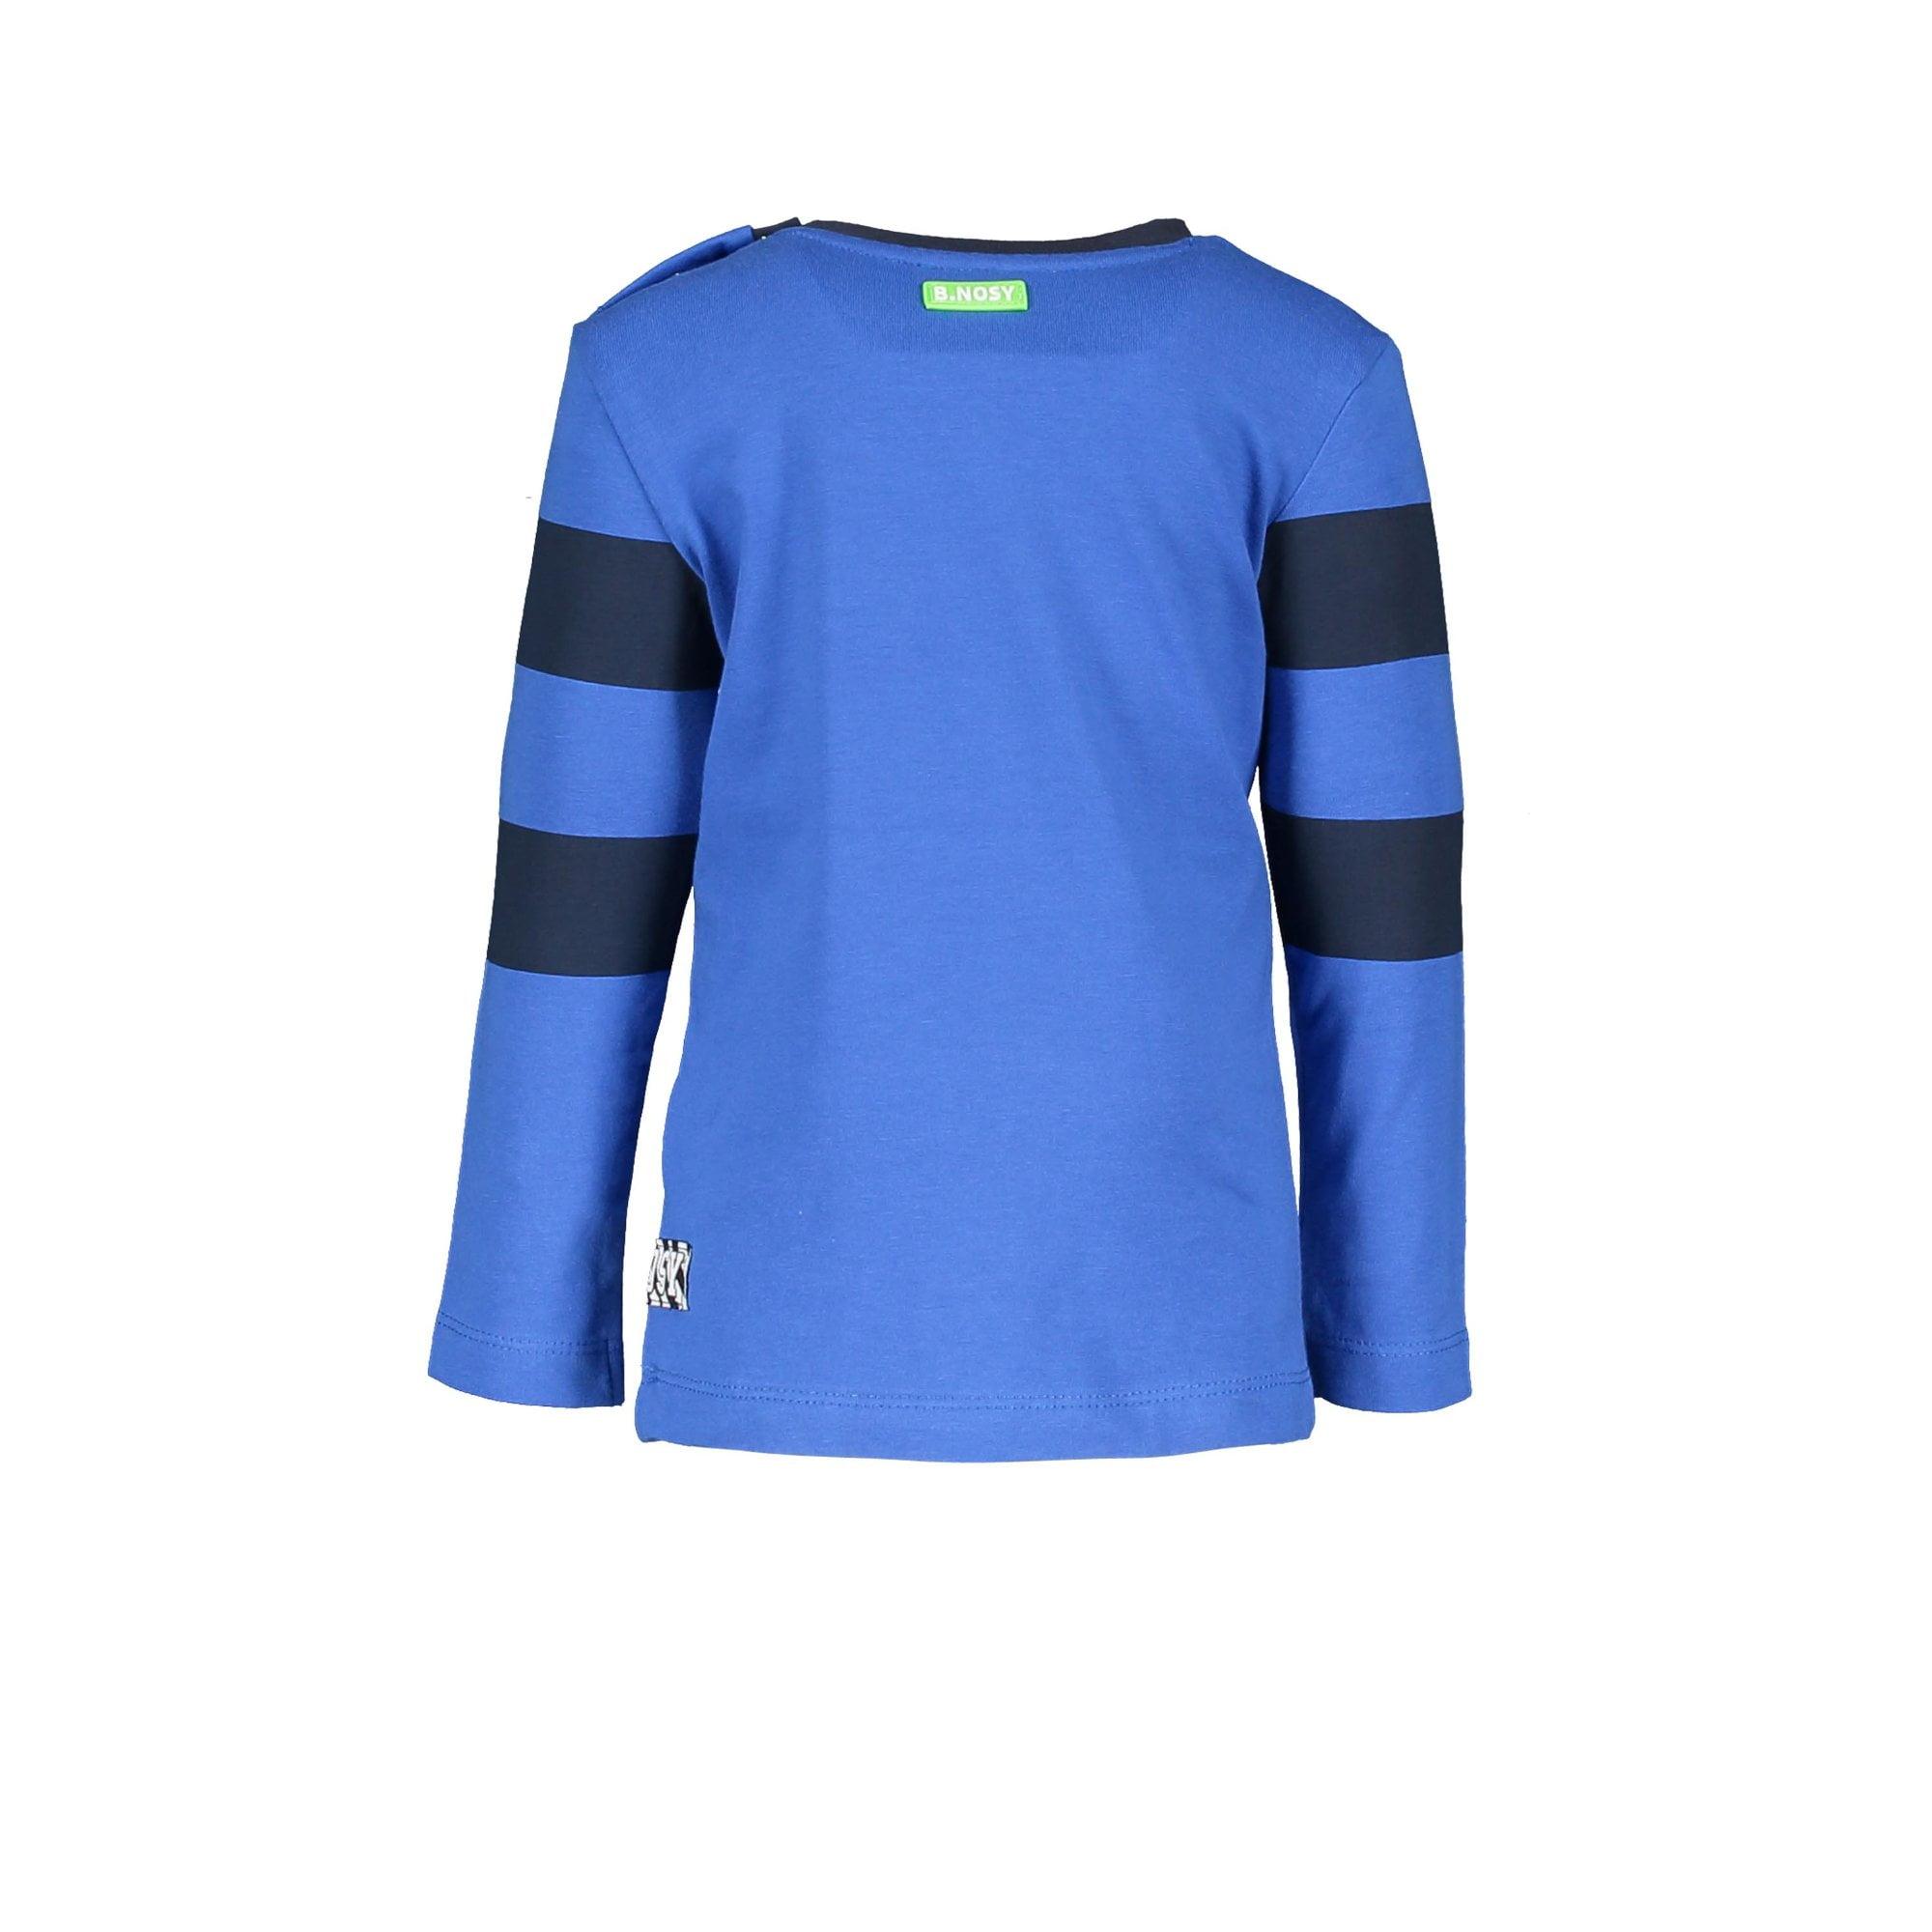 Y008-8431_194 T-shirts Baby Nautical blue